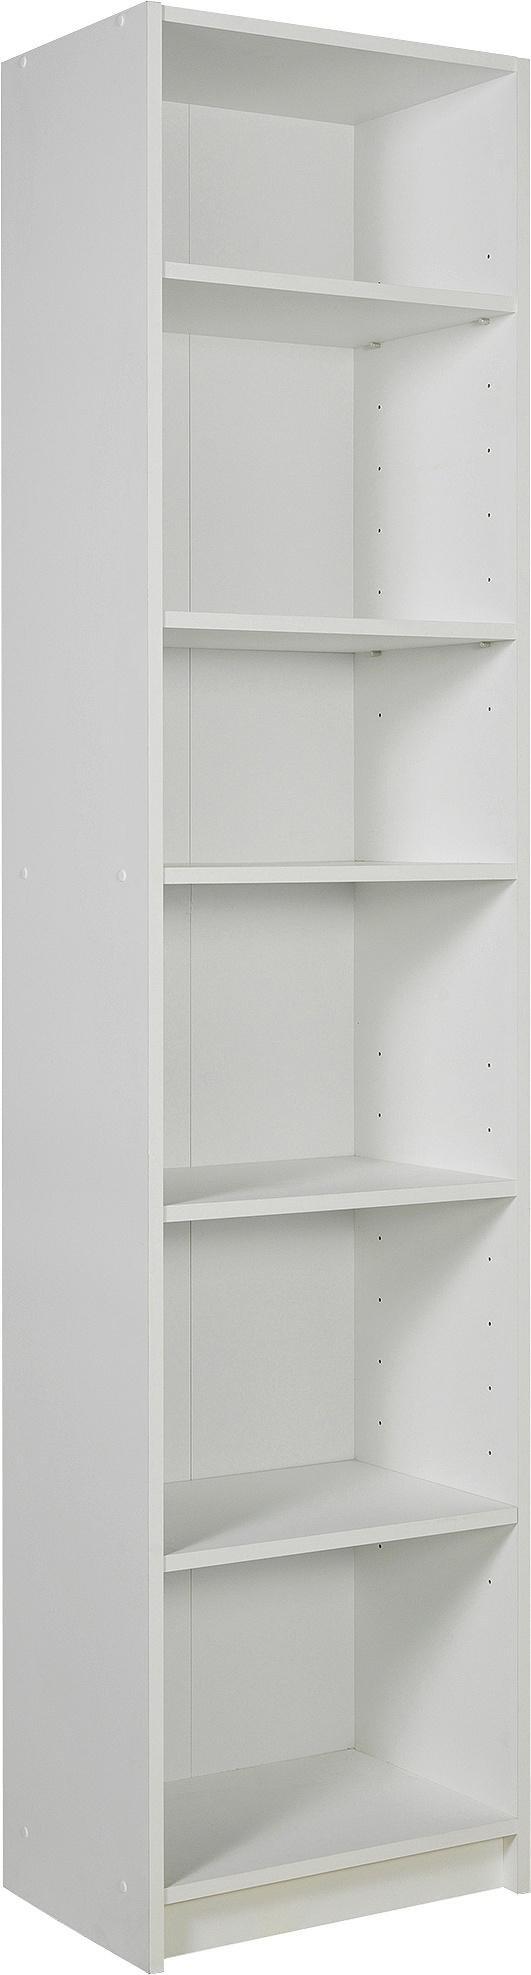 Buy Home Maine 5 Shelf Half Width Extra Deep Bookcase White